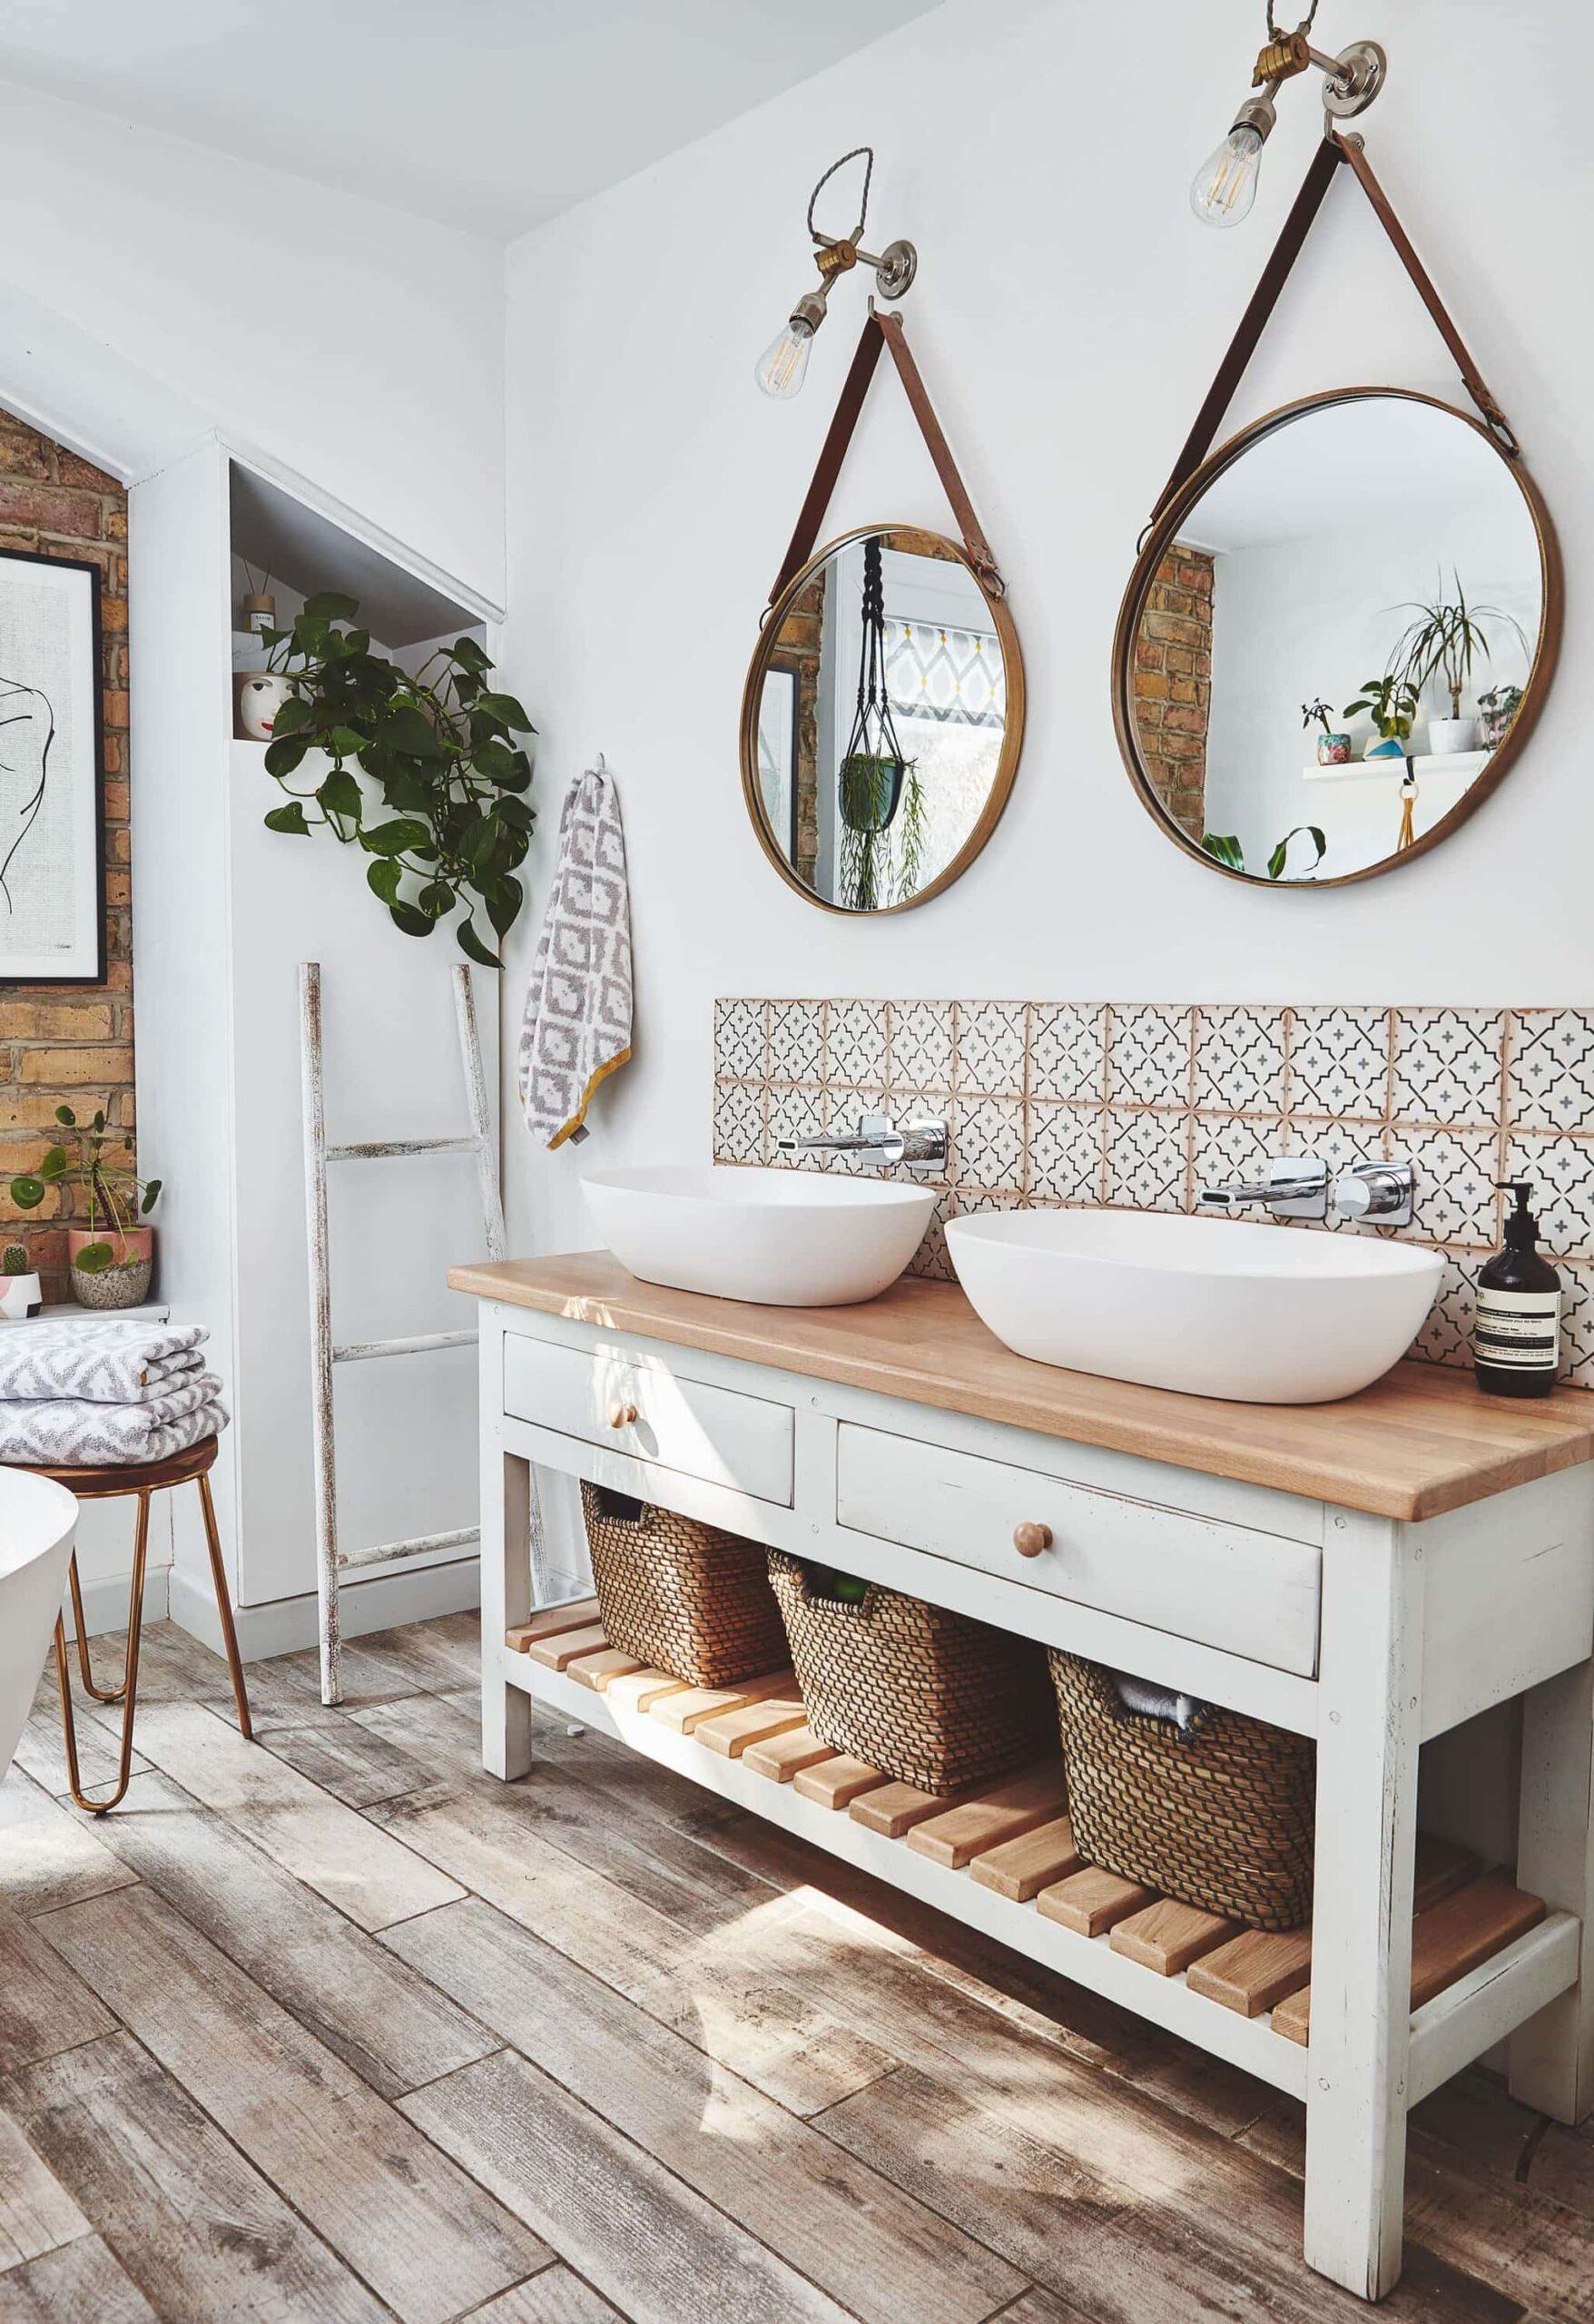 bohemian bathroom with towels in rattan baskets under vanity